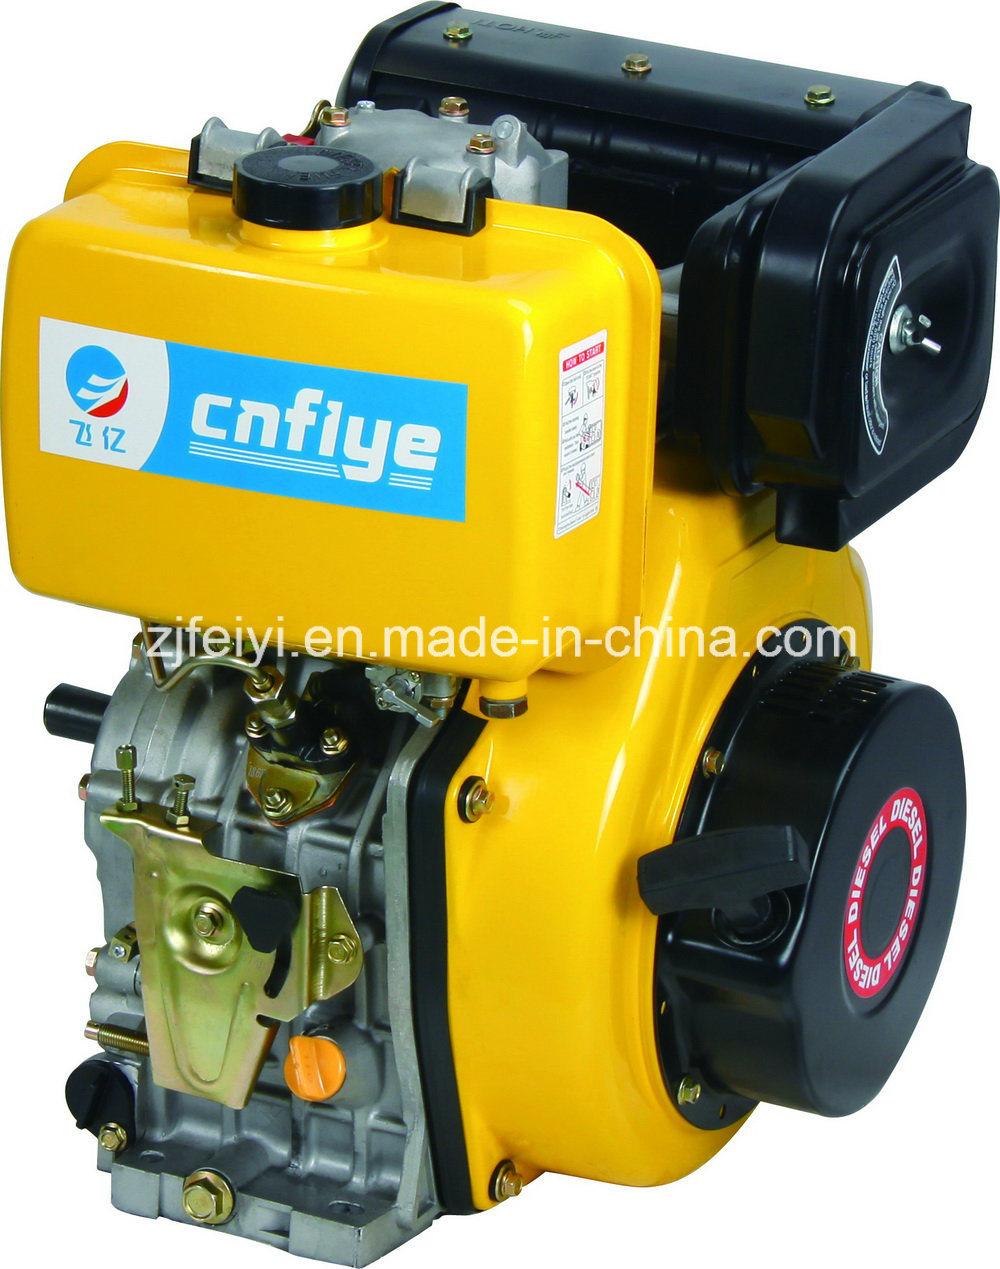 Fy-A0023 178f Professional Diesel Engine